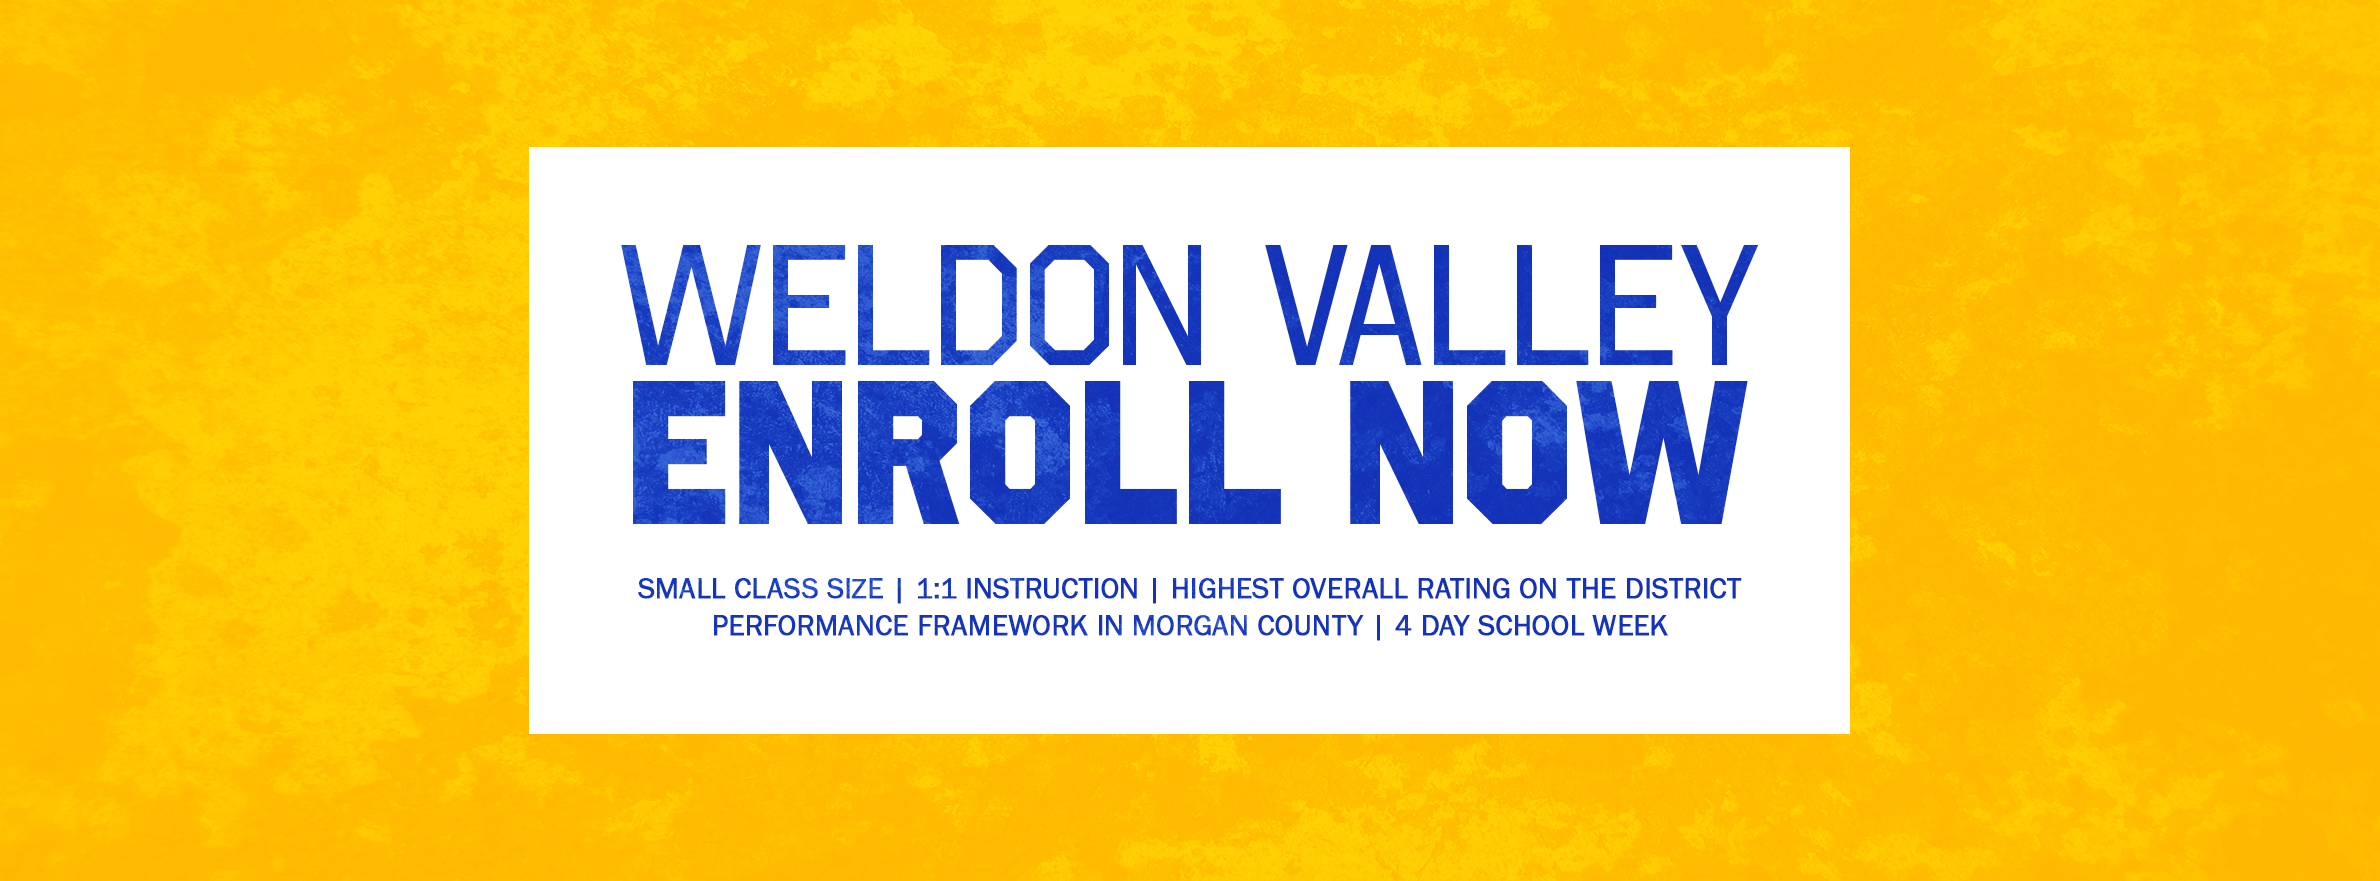 weldon valley enroll now